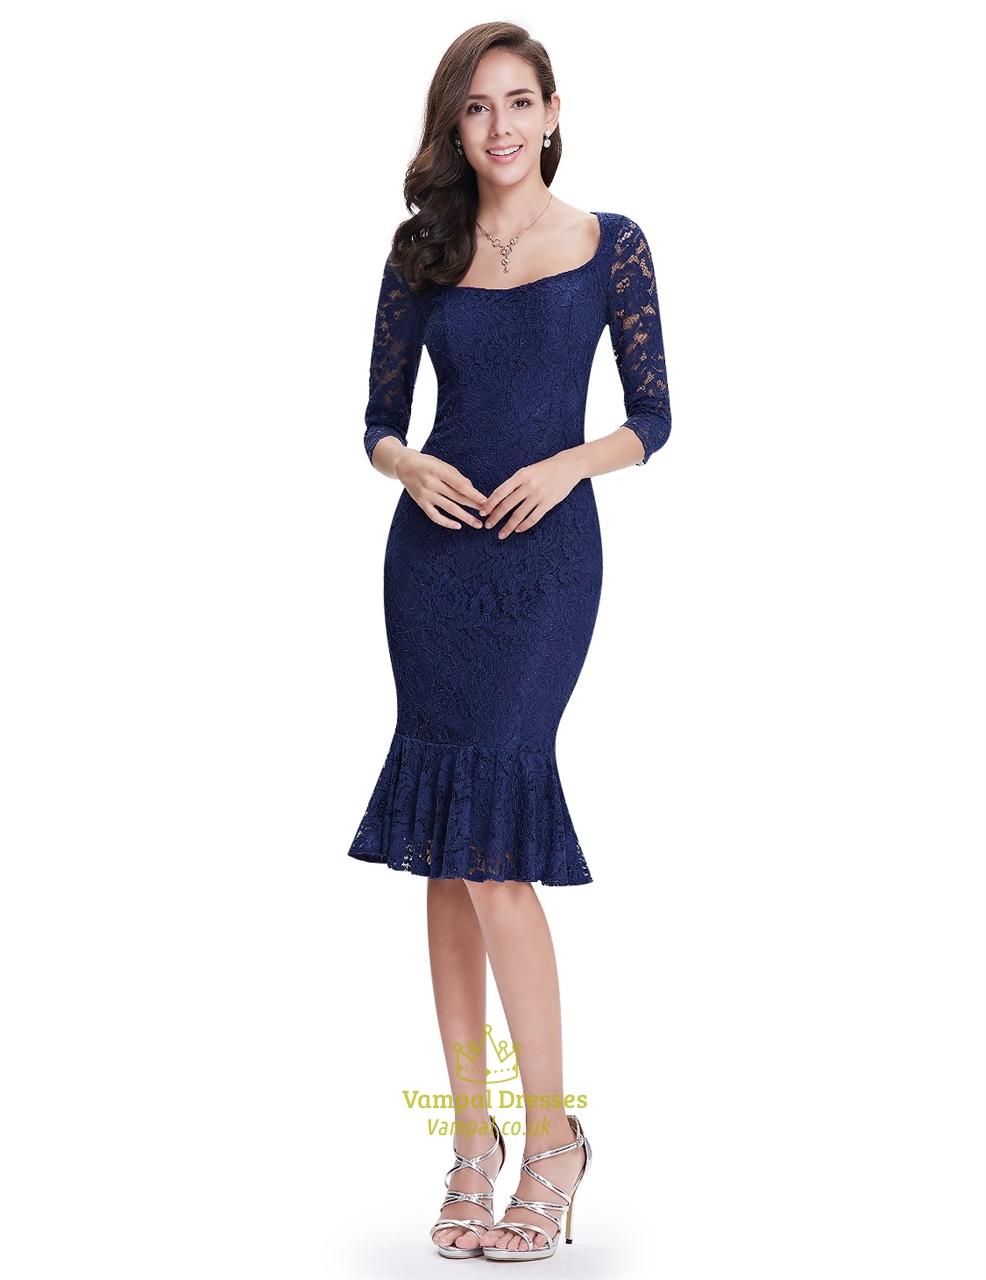 fdce33b90c2e0 Navy Blue Mermaid Tea Length Lace Prom Dresses Illusion 3/4 Sleeves SKU  -NW1444